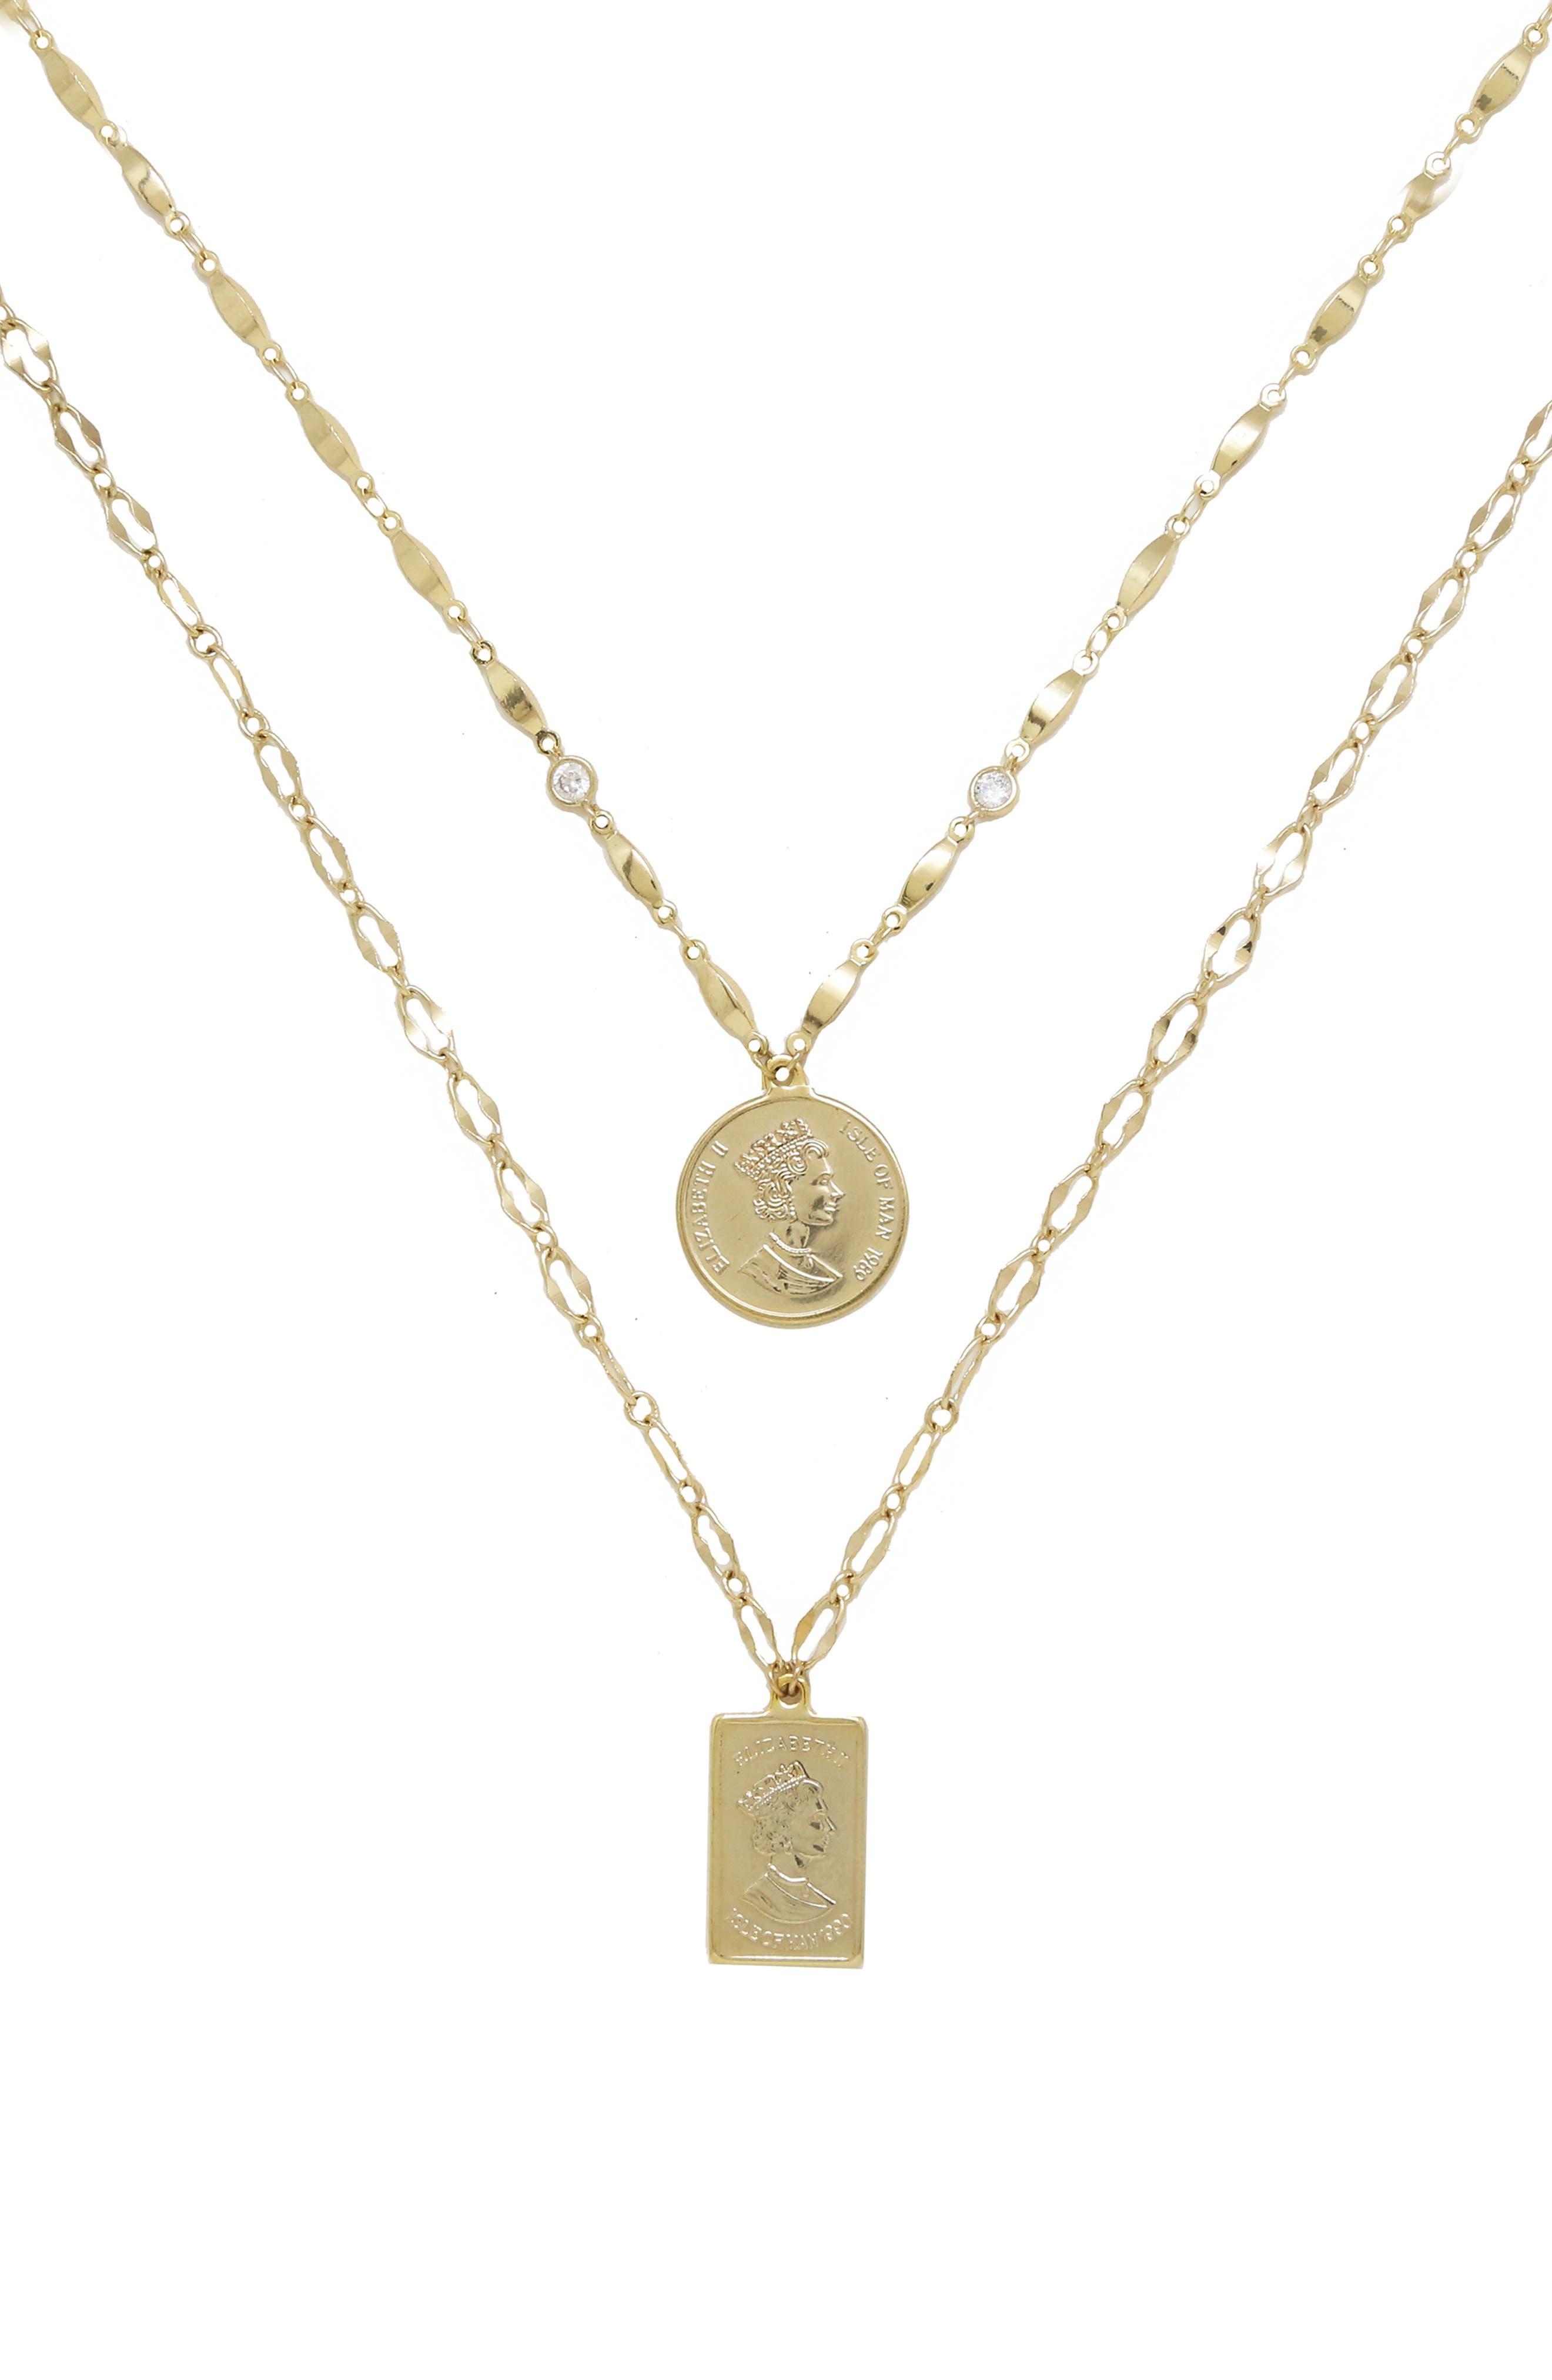 ETTIKA, Set of 2 Pendant Necklaces, Main thumbnail 1, color, GOLD